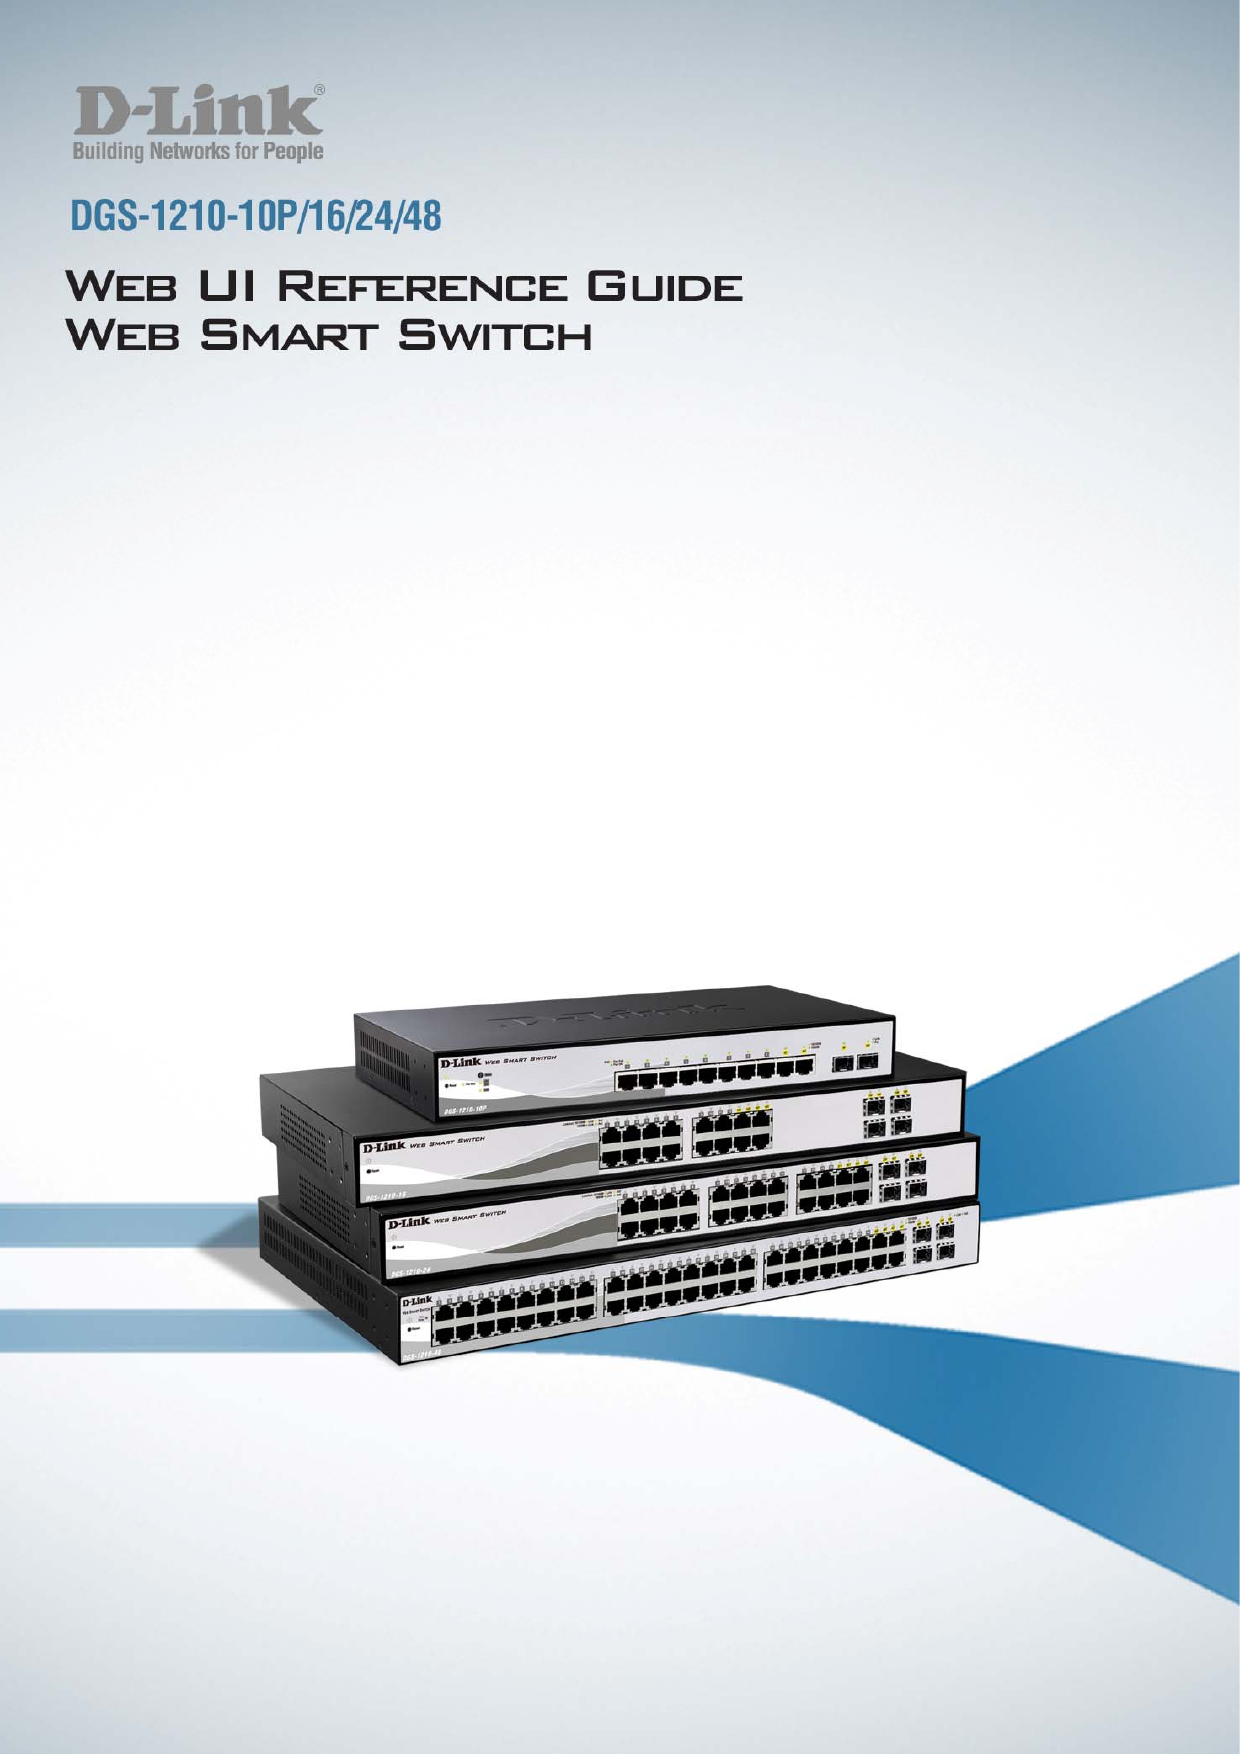 24 Port Dgs 1224t Firefox Web Smart Switch 1514872803dgs 1210 48 Ui D Link 10 E Reference Guide 202 En